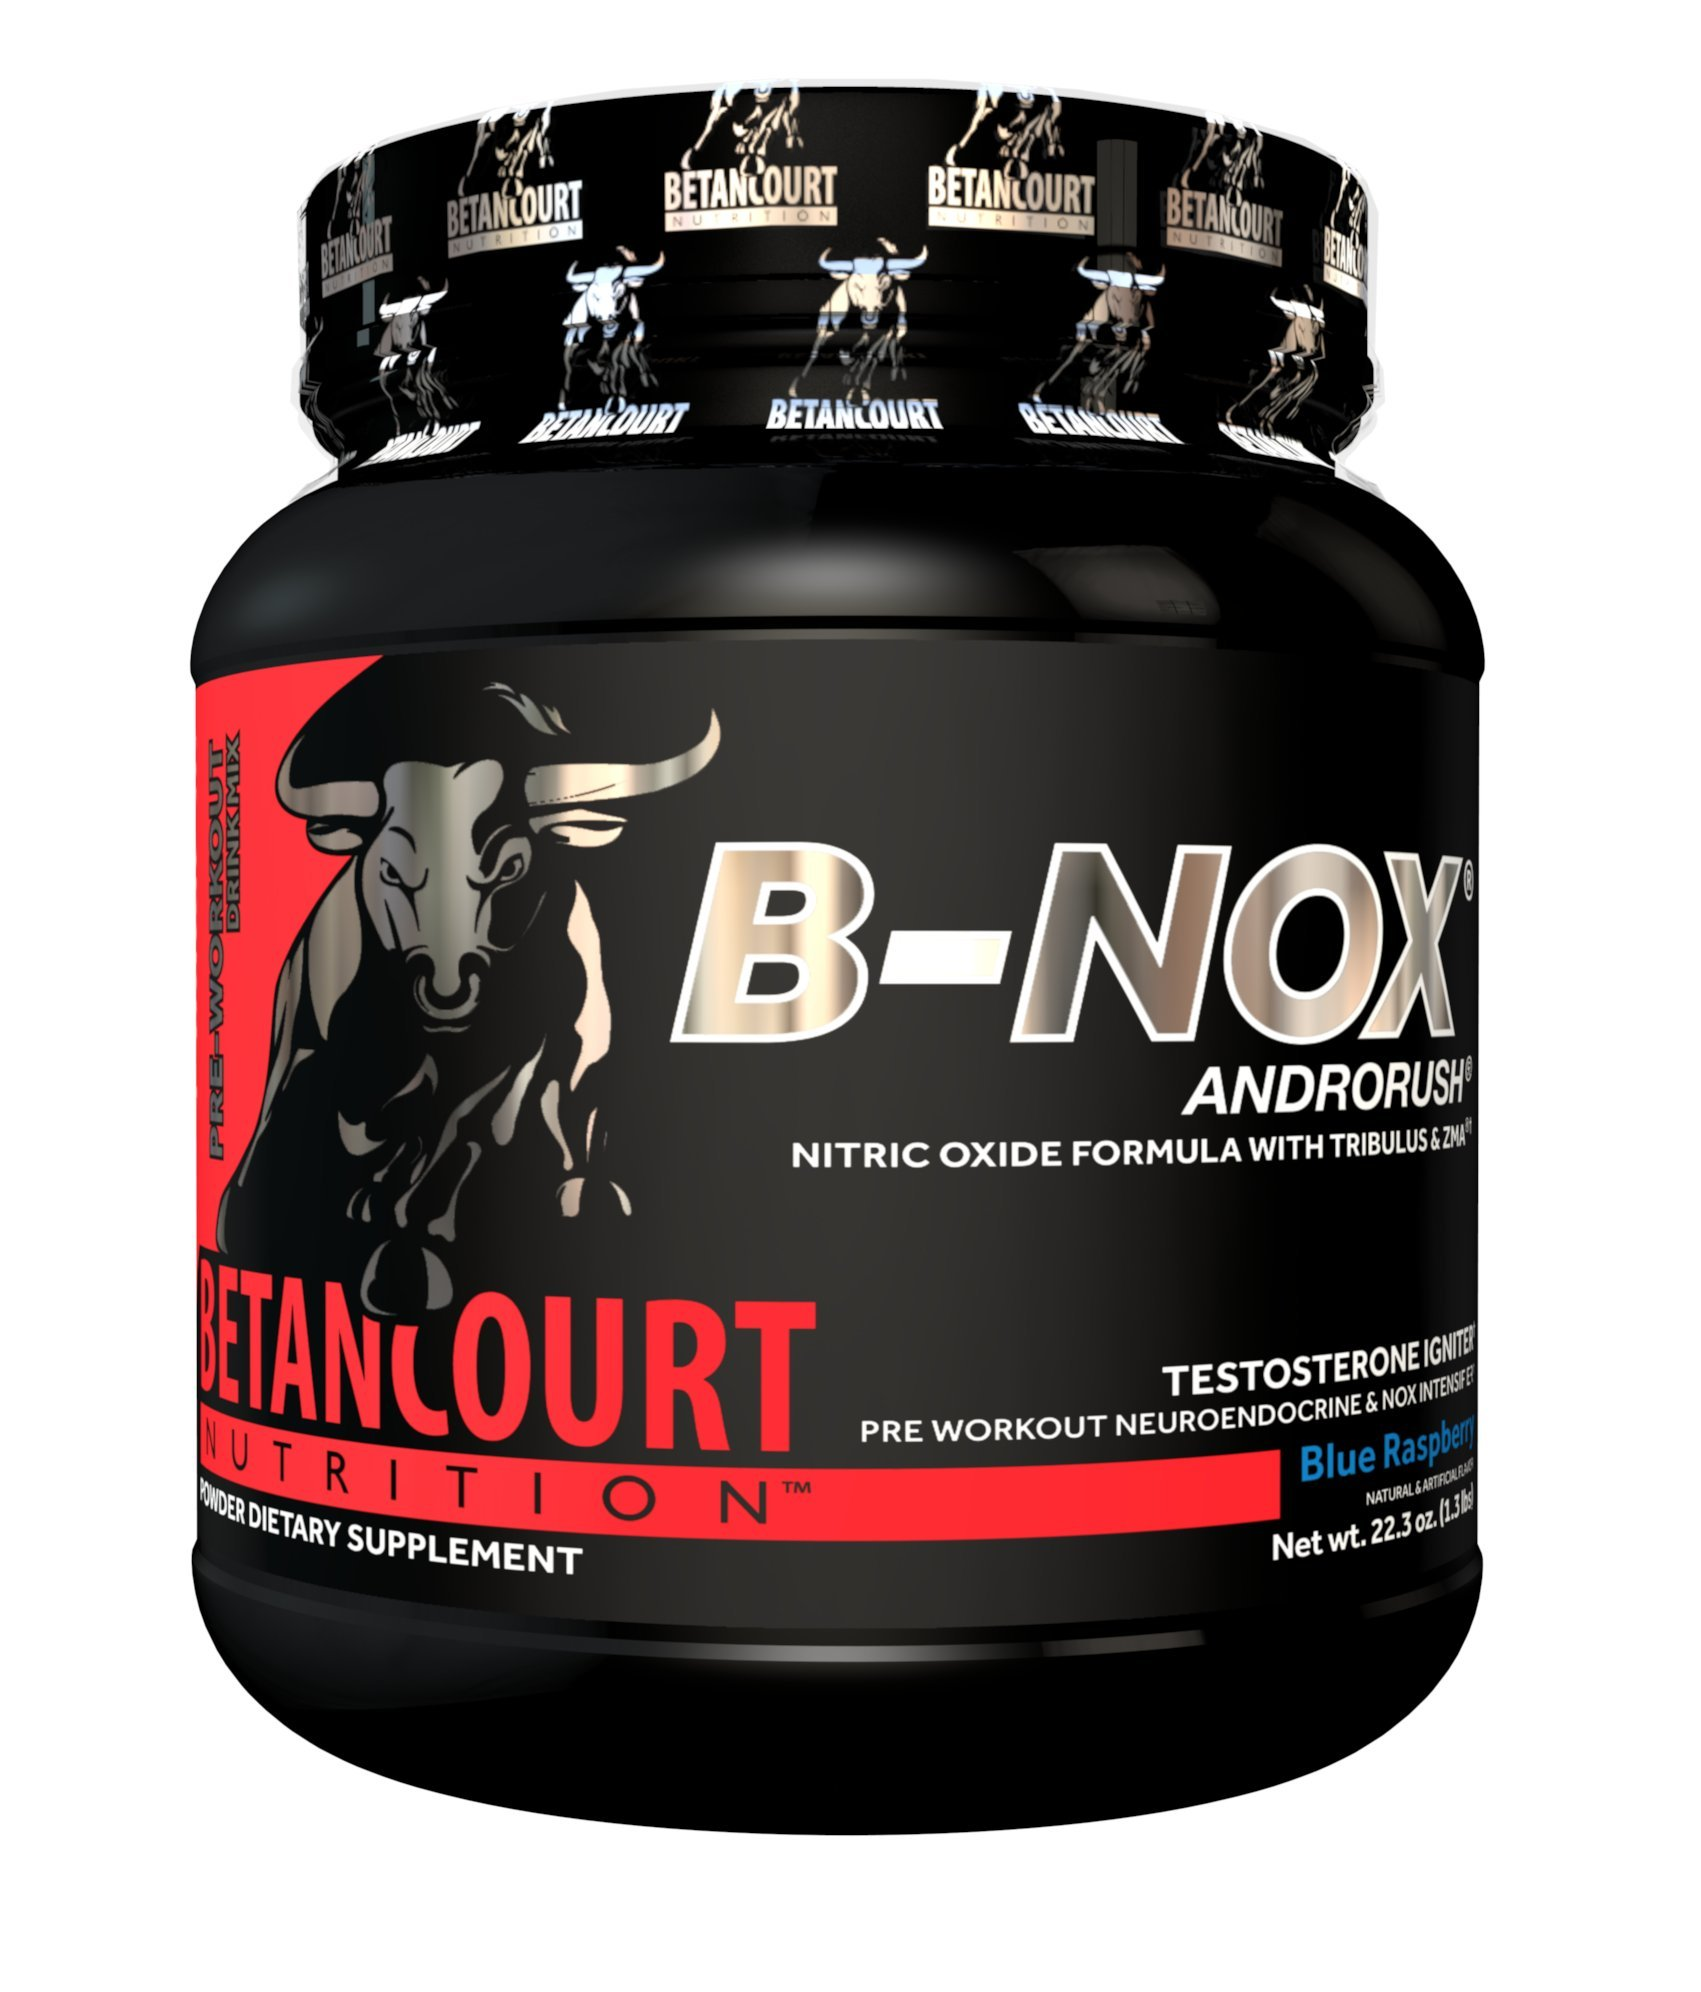 Betancourt Nutrition B-Nox Andorush Pre-Workout, Blue Raspberry, 22.3 Ounce by Betancourt Nutrition